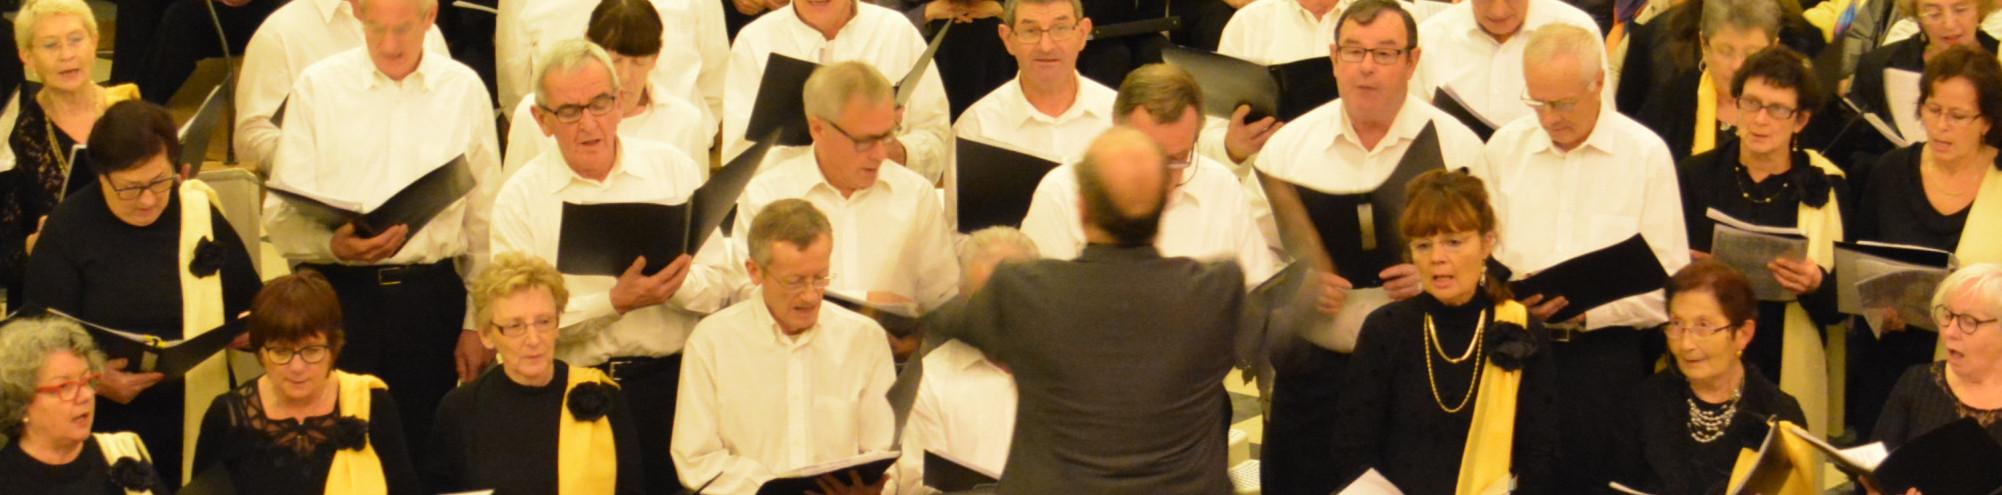 Bandeau de la page 'CHORALINES – KORHOLEN Chorale